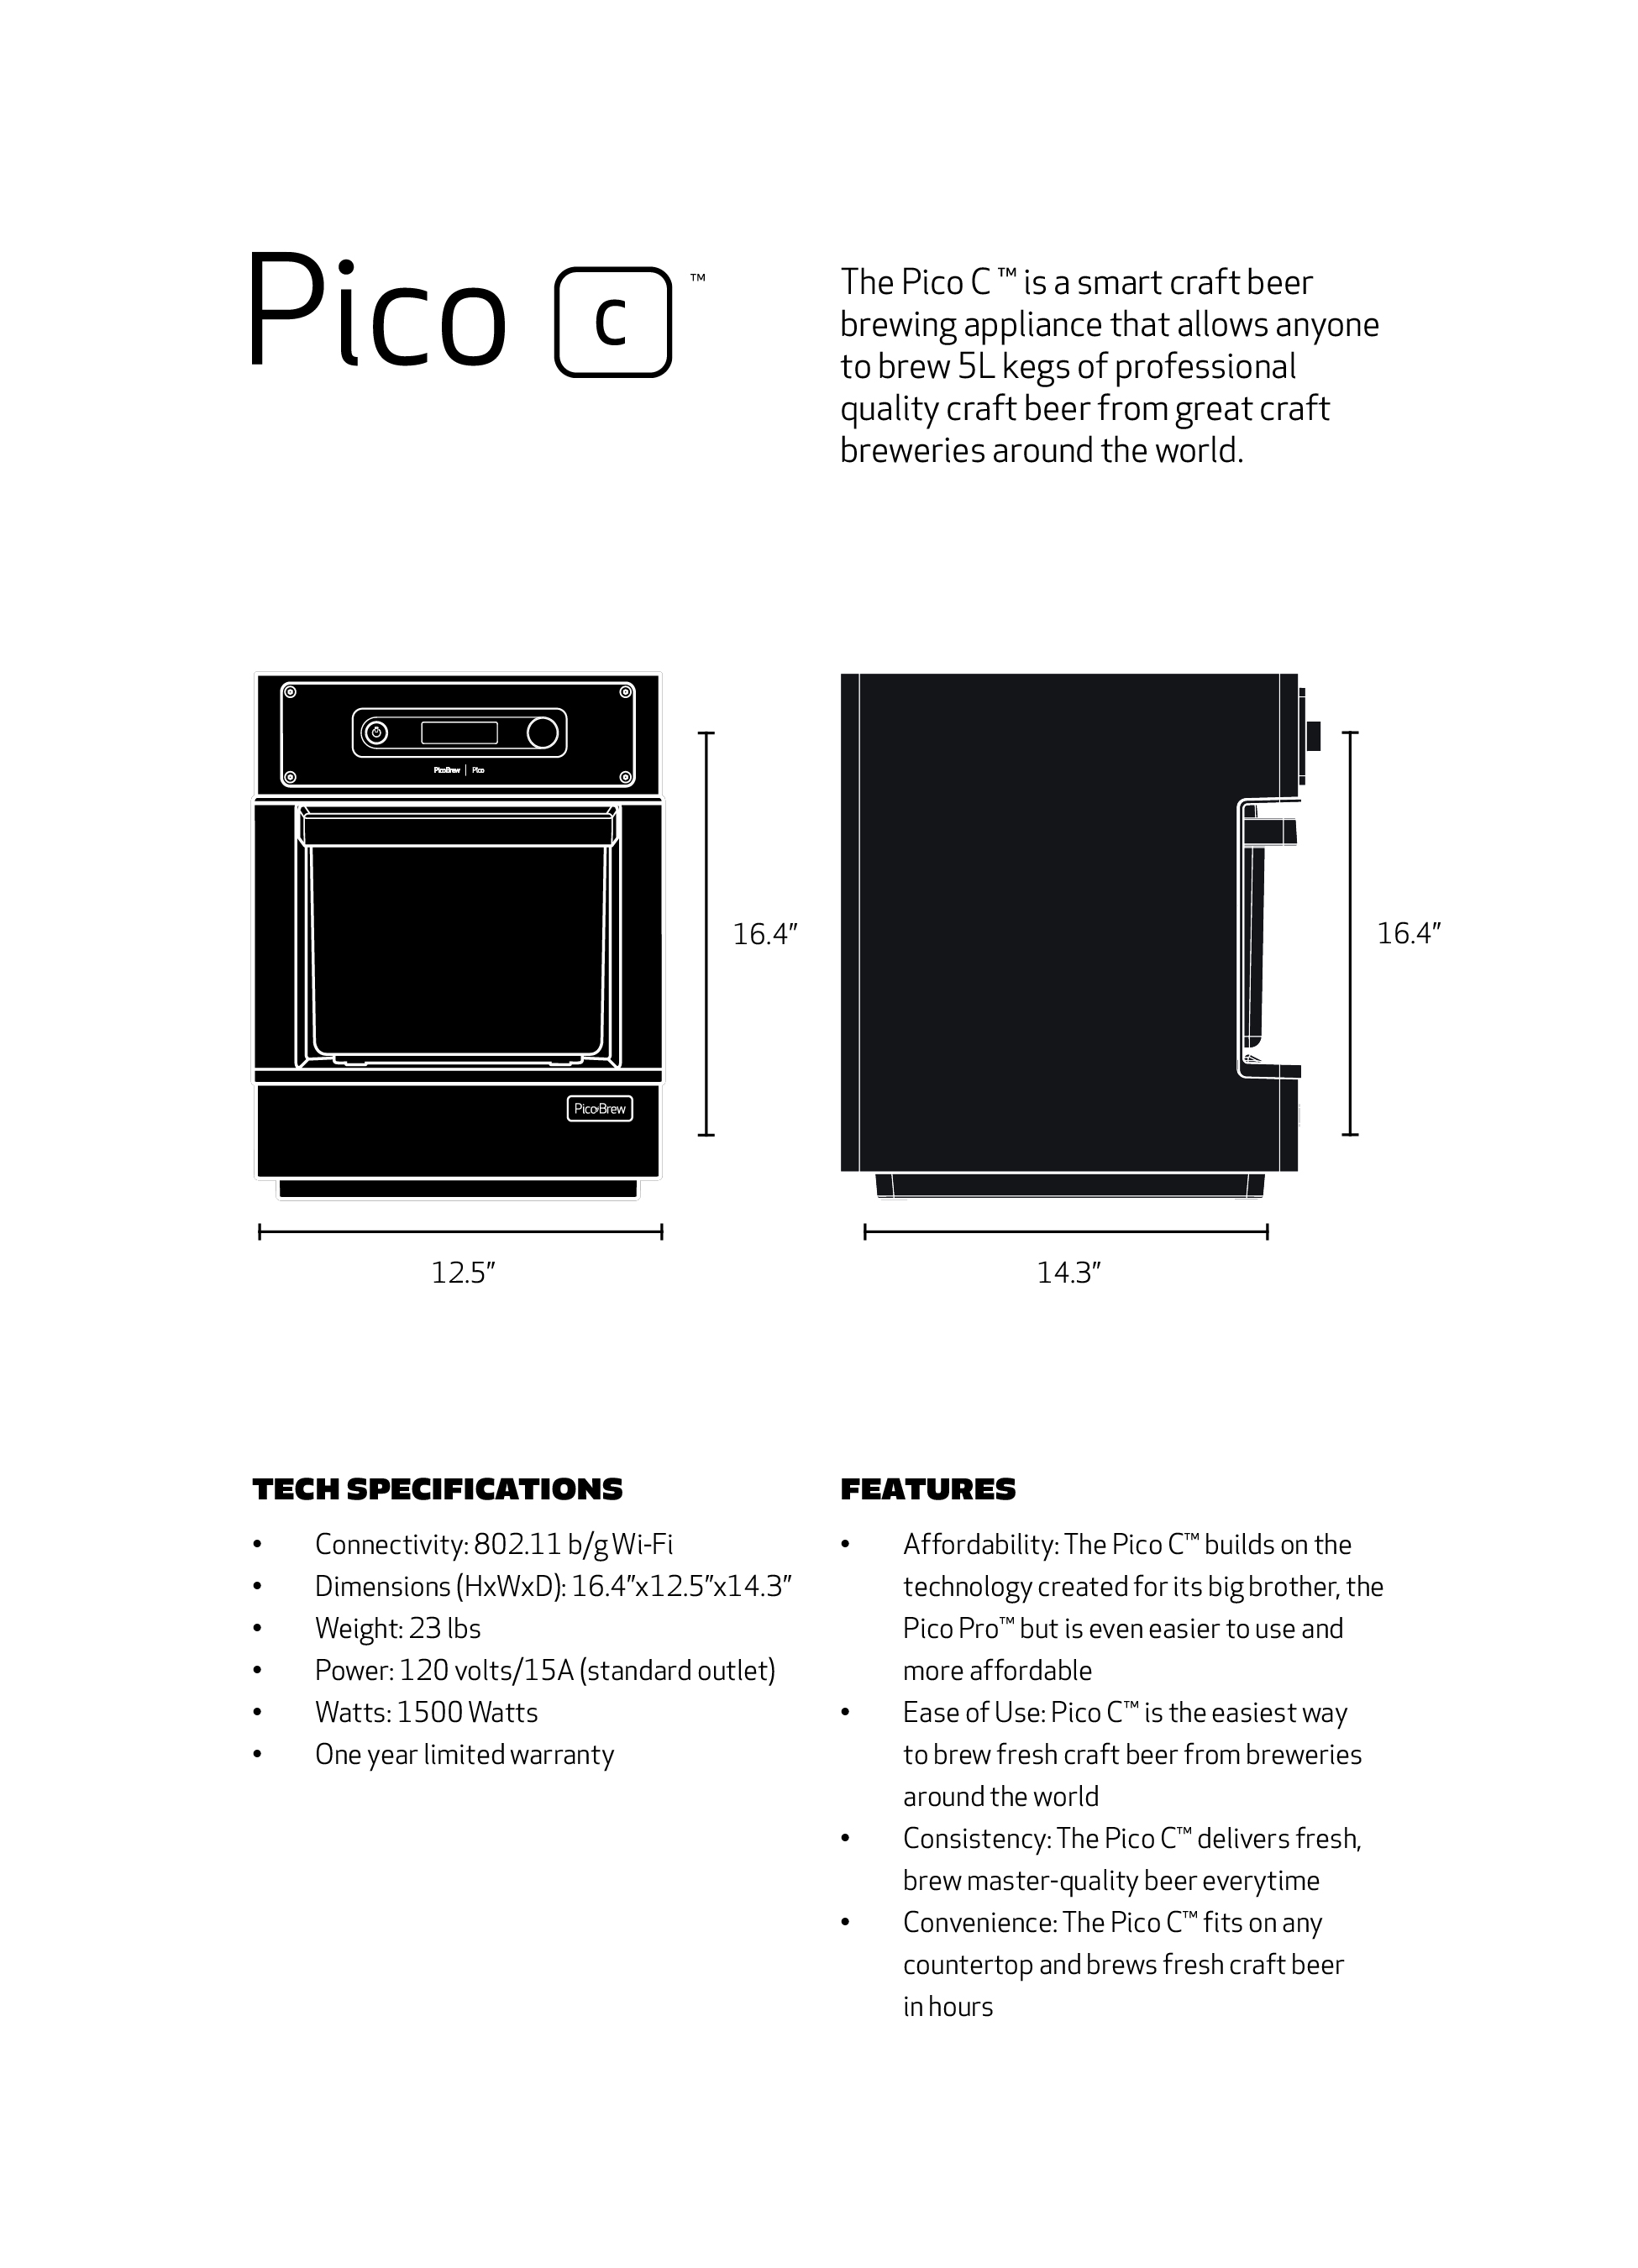 Pico_Infographic-01.jpg